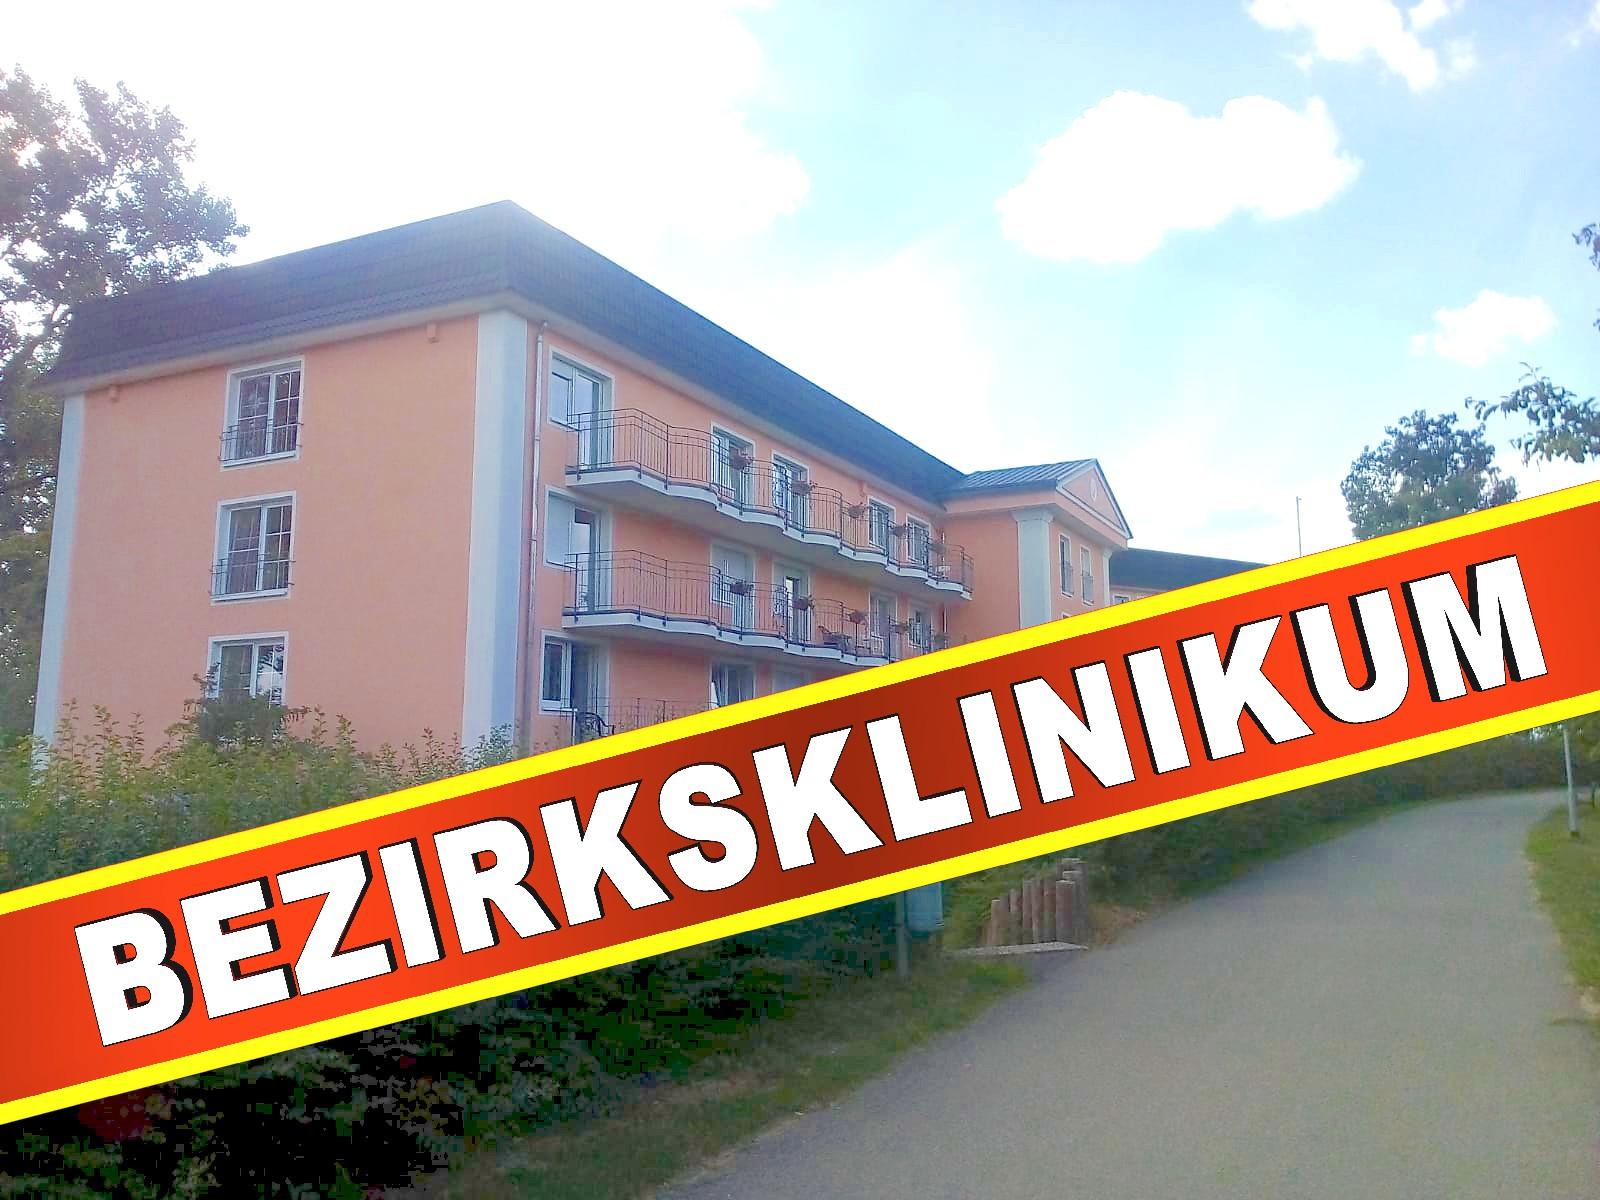 Bezirksklinikum Obermain Kutzenberg, 96250 Ebensfeld Psychiatrie Polizei Krankenhaus (47)